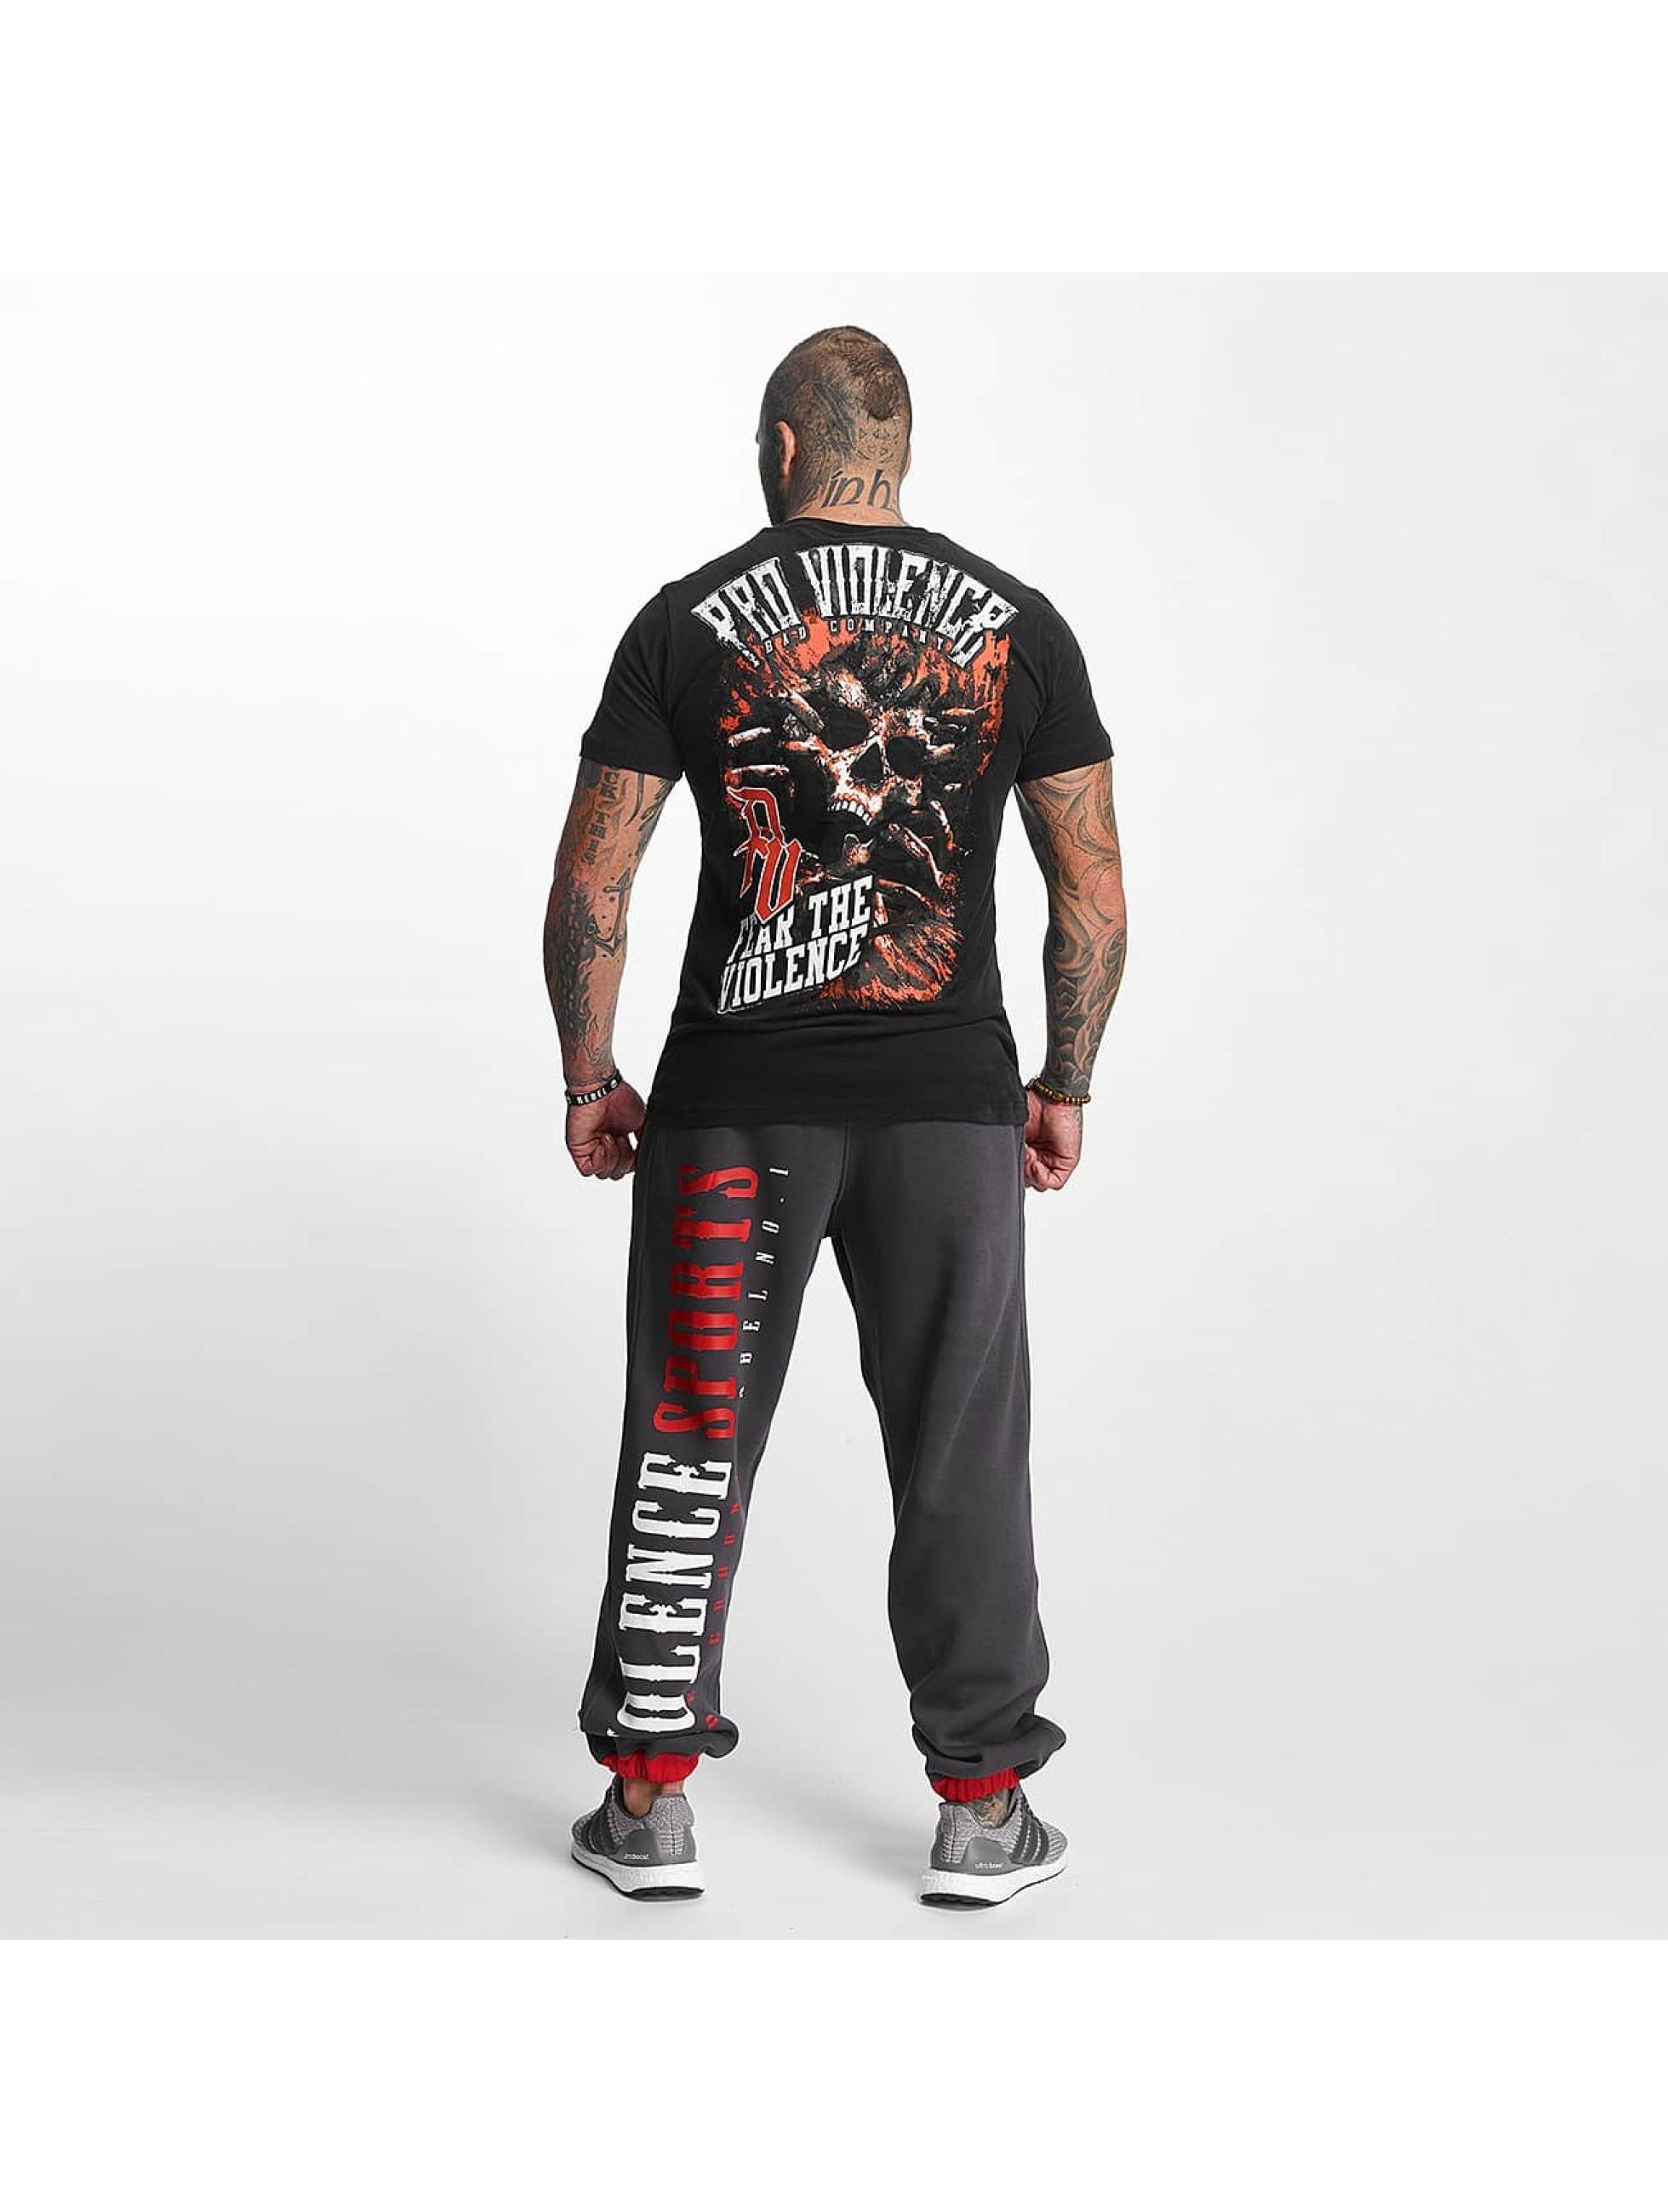 Pro Violence Streetwear Camiseta The Violence Fear negro